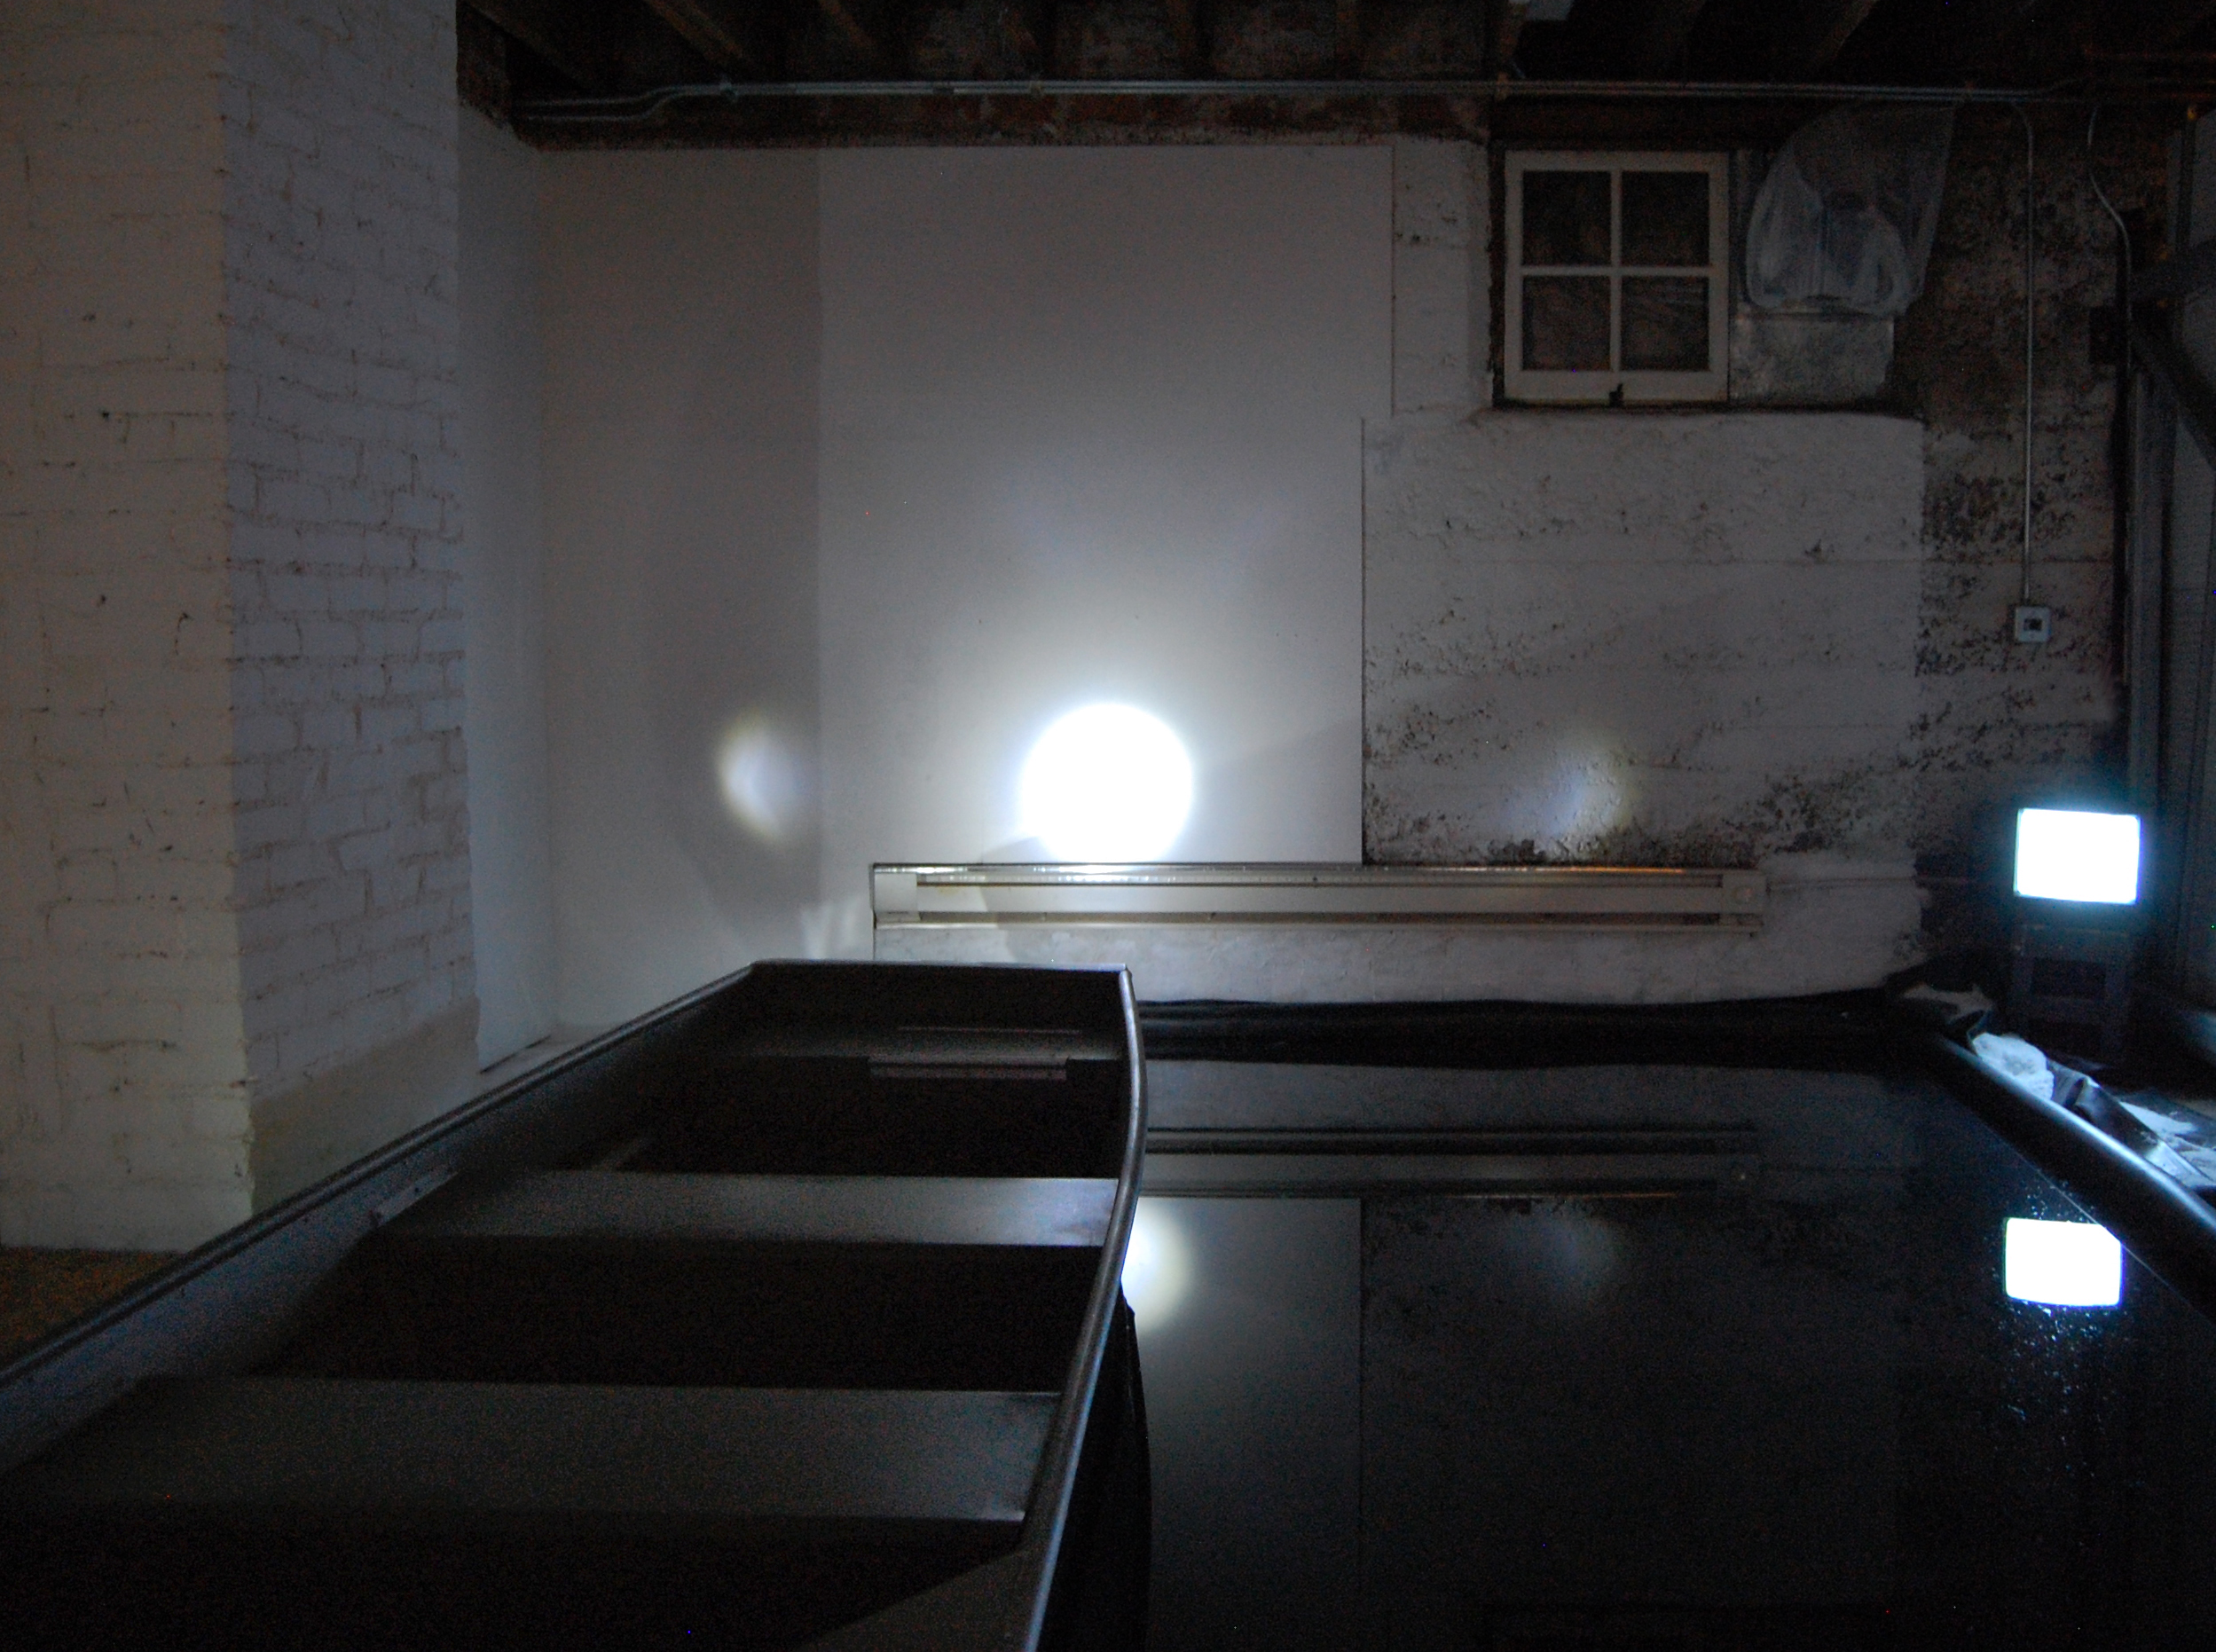 Krogstad_M_Untitled(nightboatS)_2012.jpg